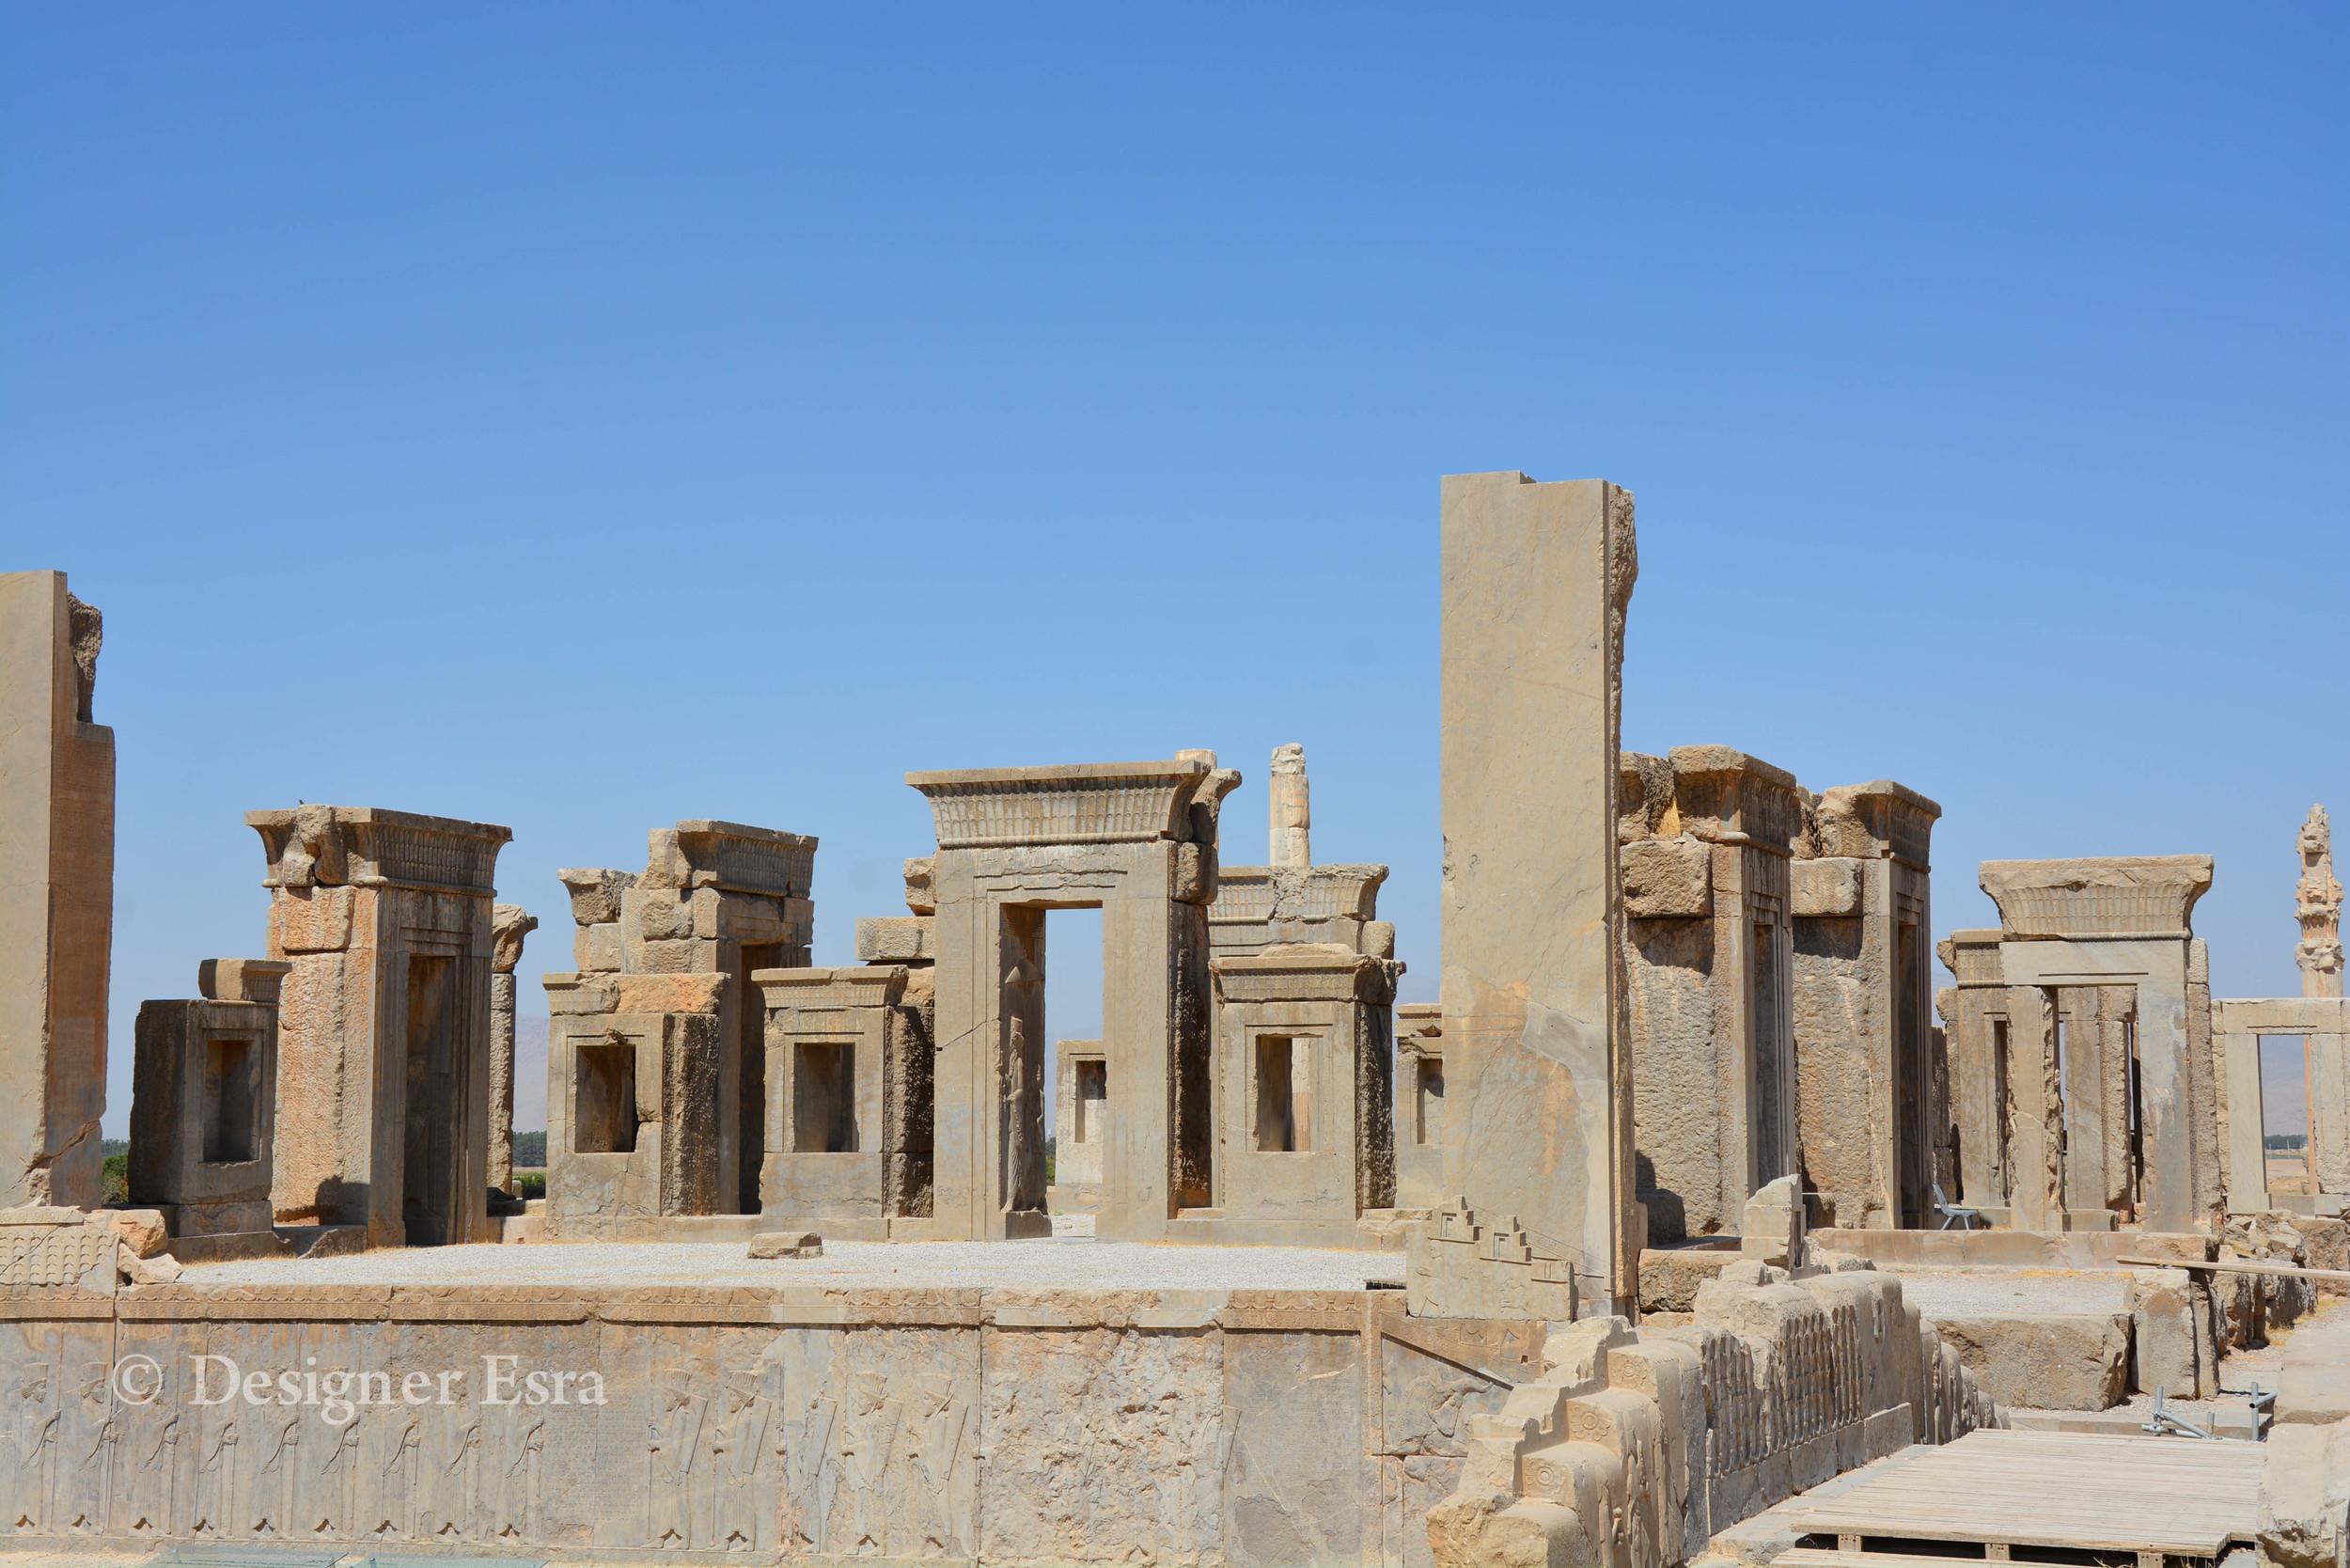 Gate of All Nations in Persepolis, Iran تخت جمشيد